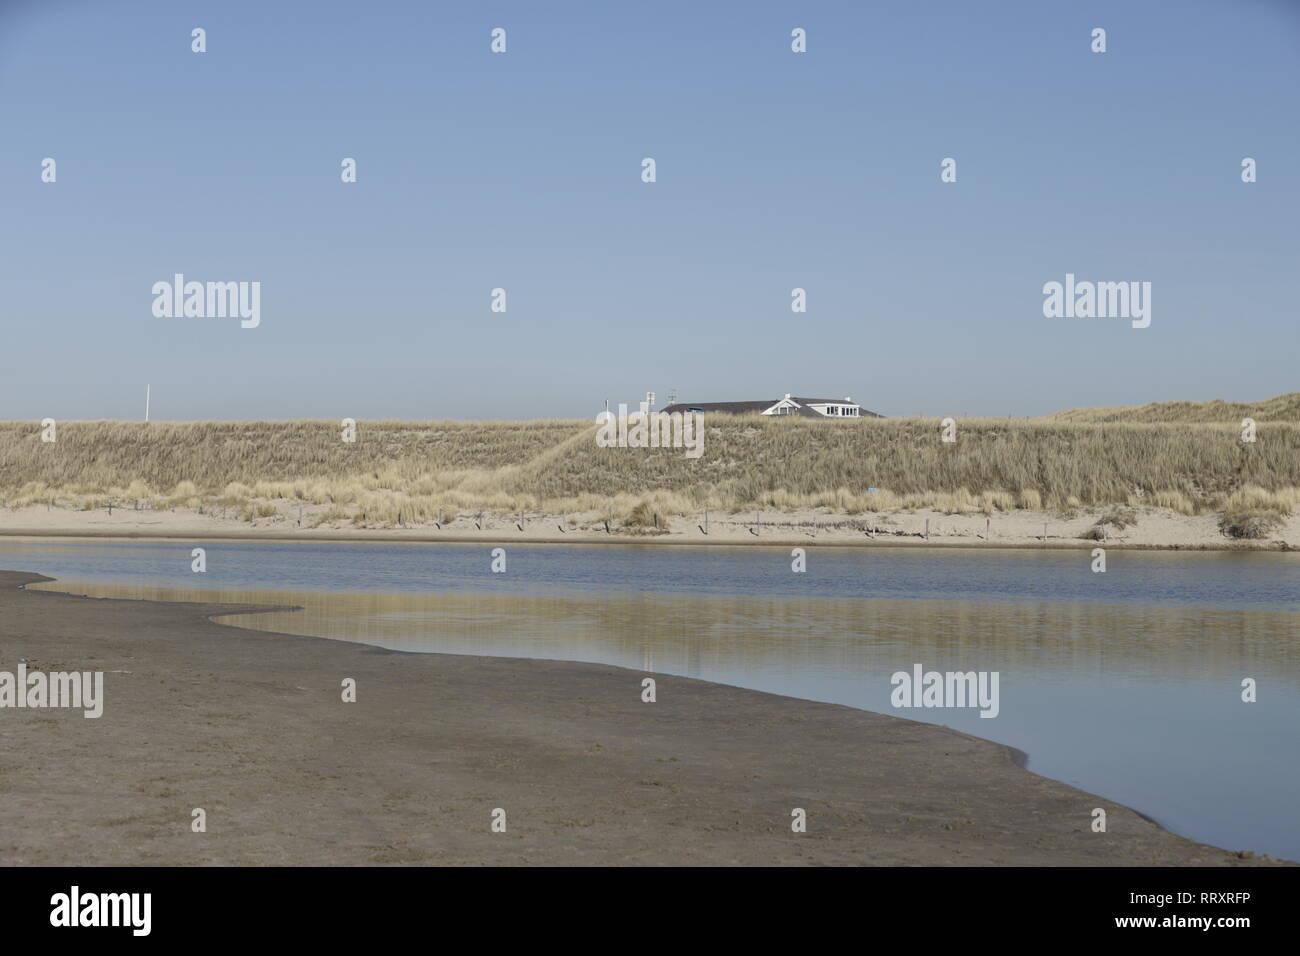 A lagune at the beach - Stock Image